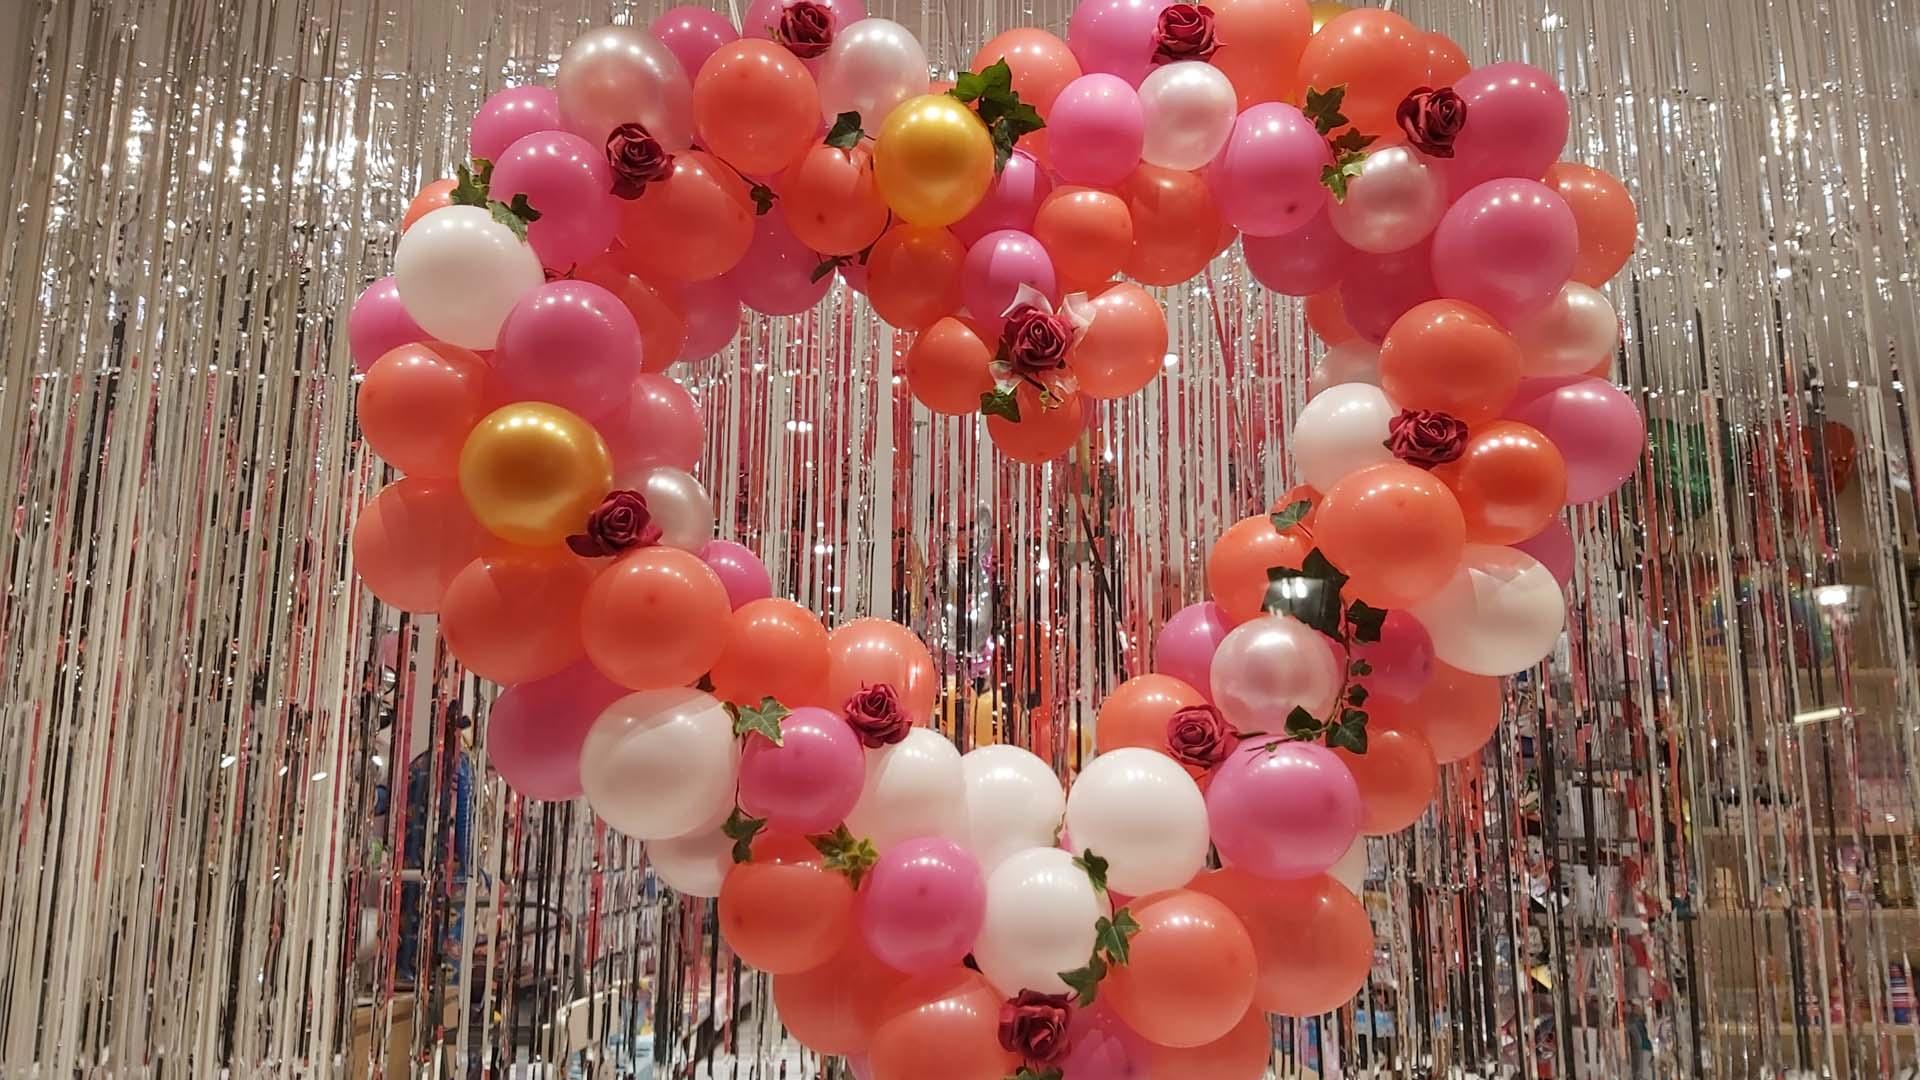 celle-city-balloon-herz.jpg